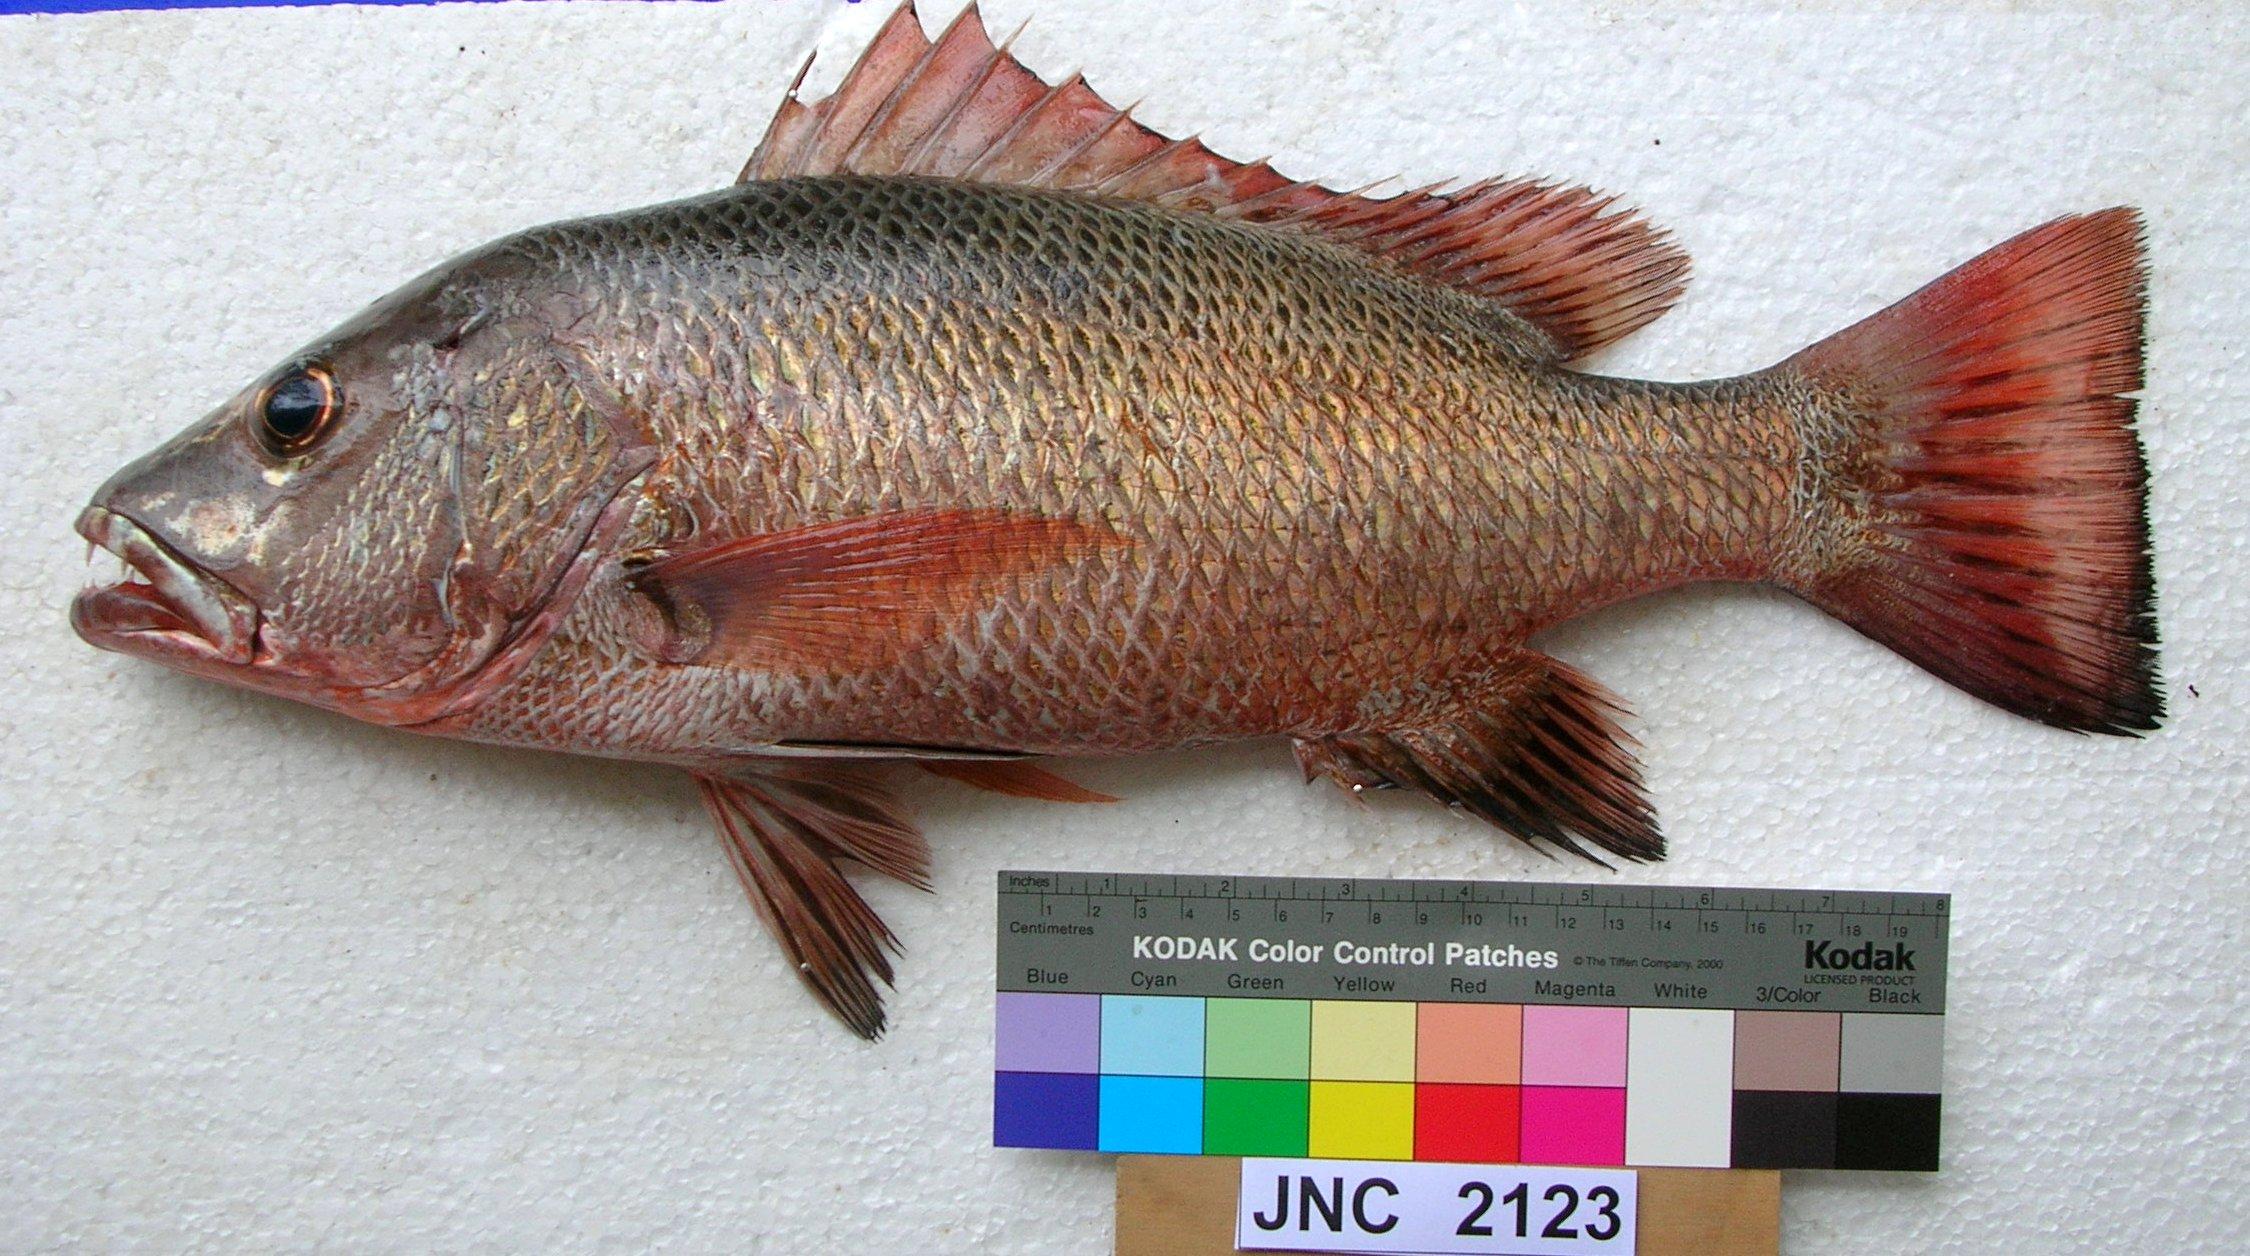 Mangrove red snapper - Wikipedia